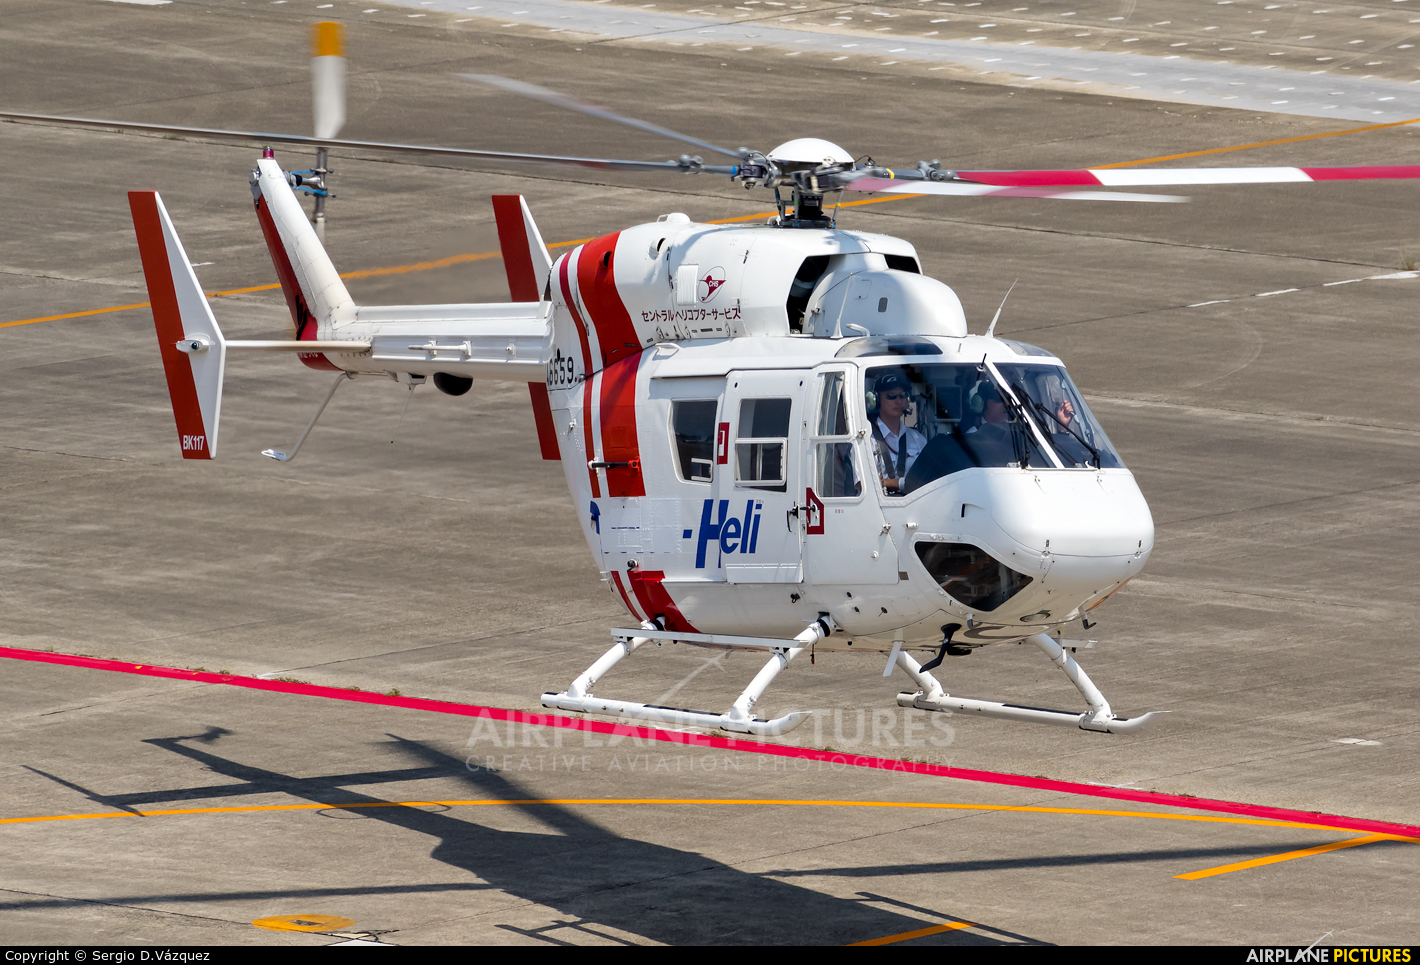 Central Helicopter Service JA6659 aircraft at Nagoya - Komaki AB